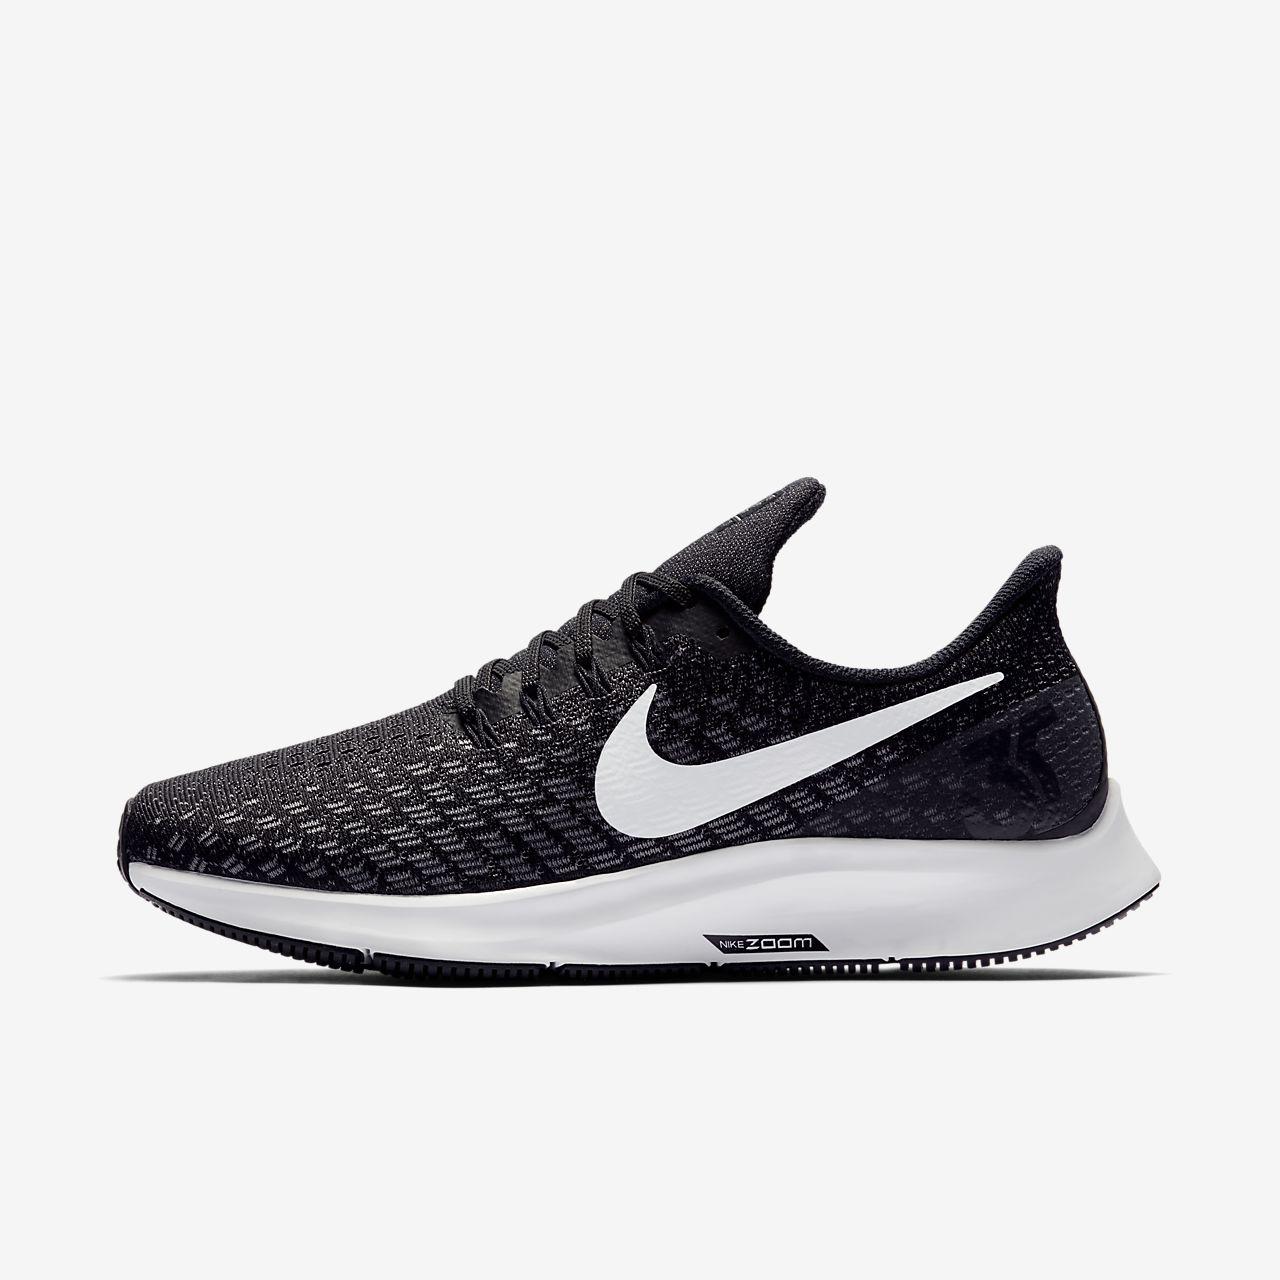 7f840599005 ... Chaussure de running Nike Air Zoom Pegasus 35 pour Femme (large)